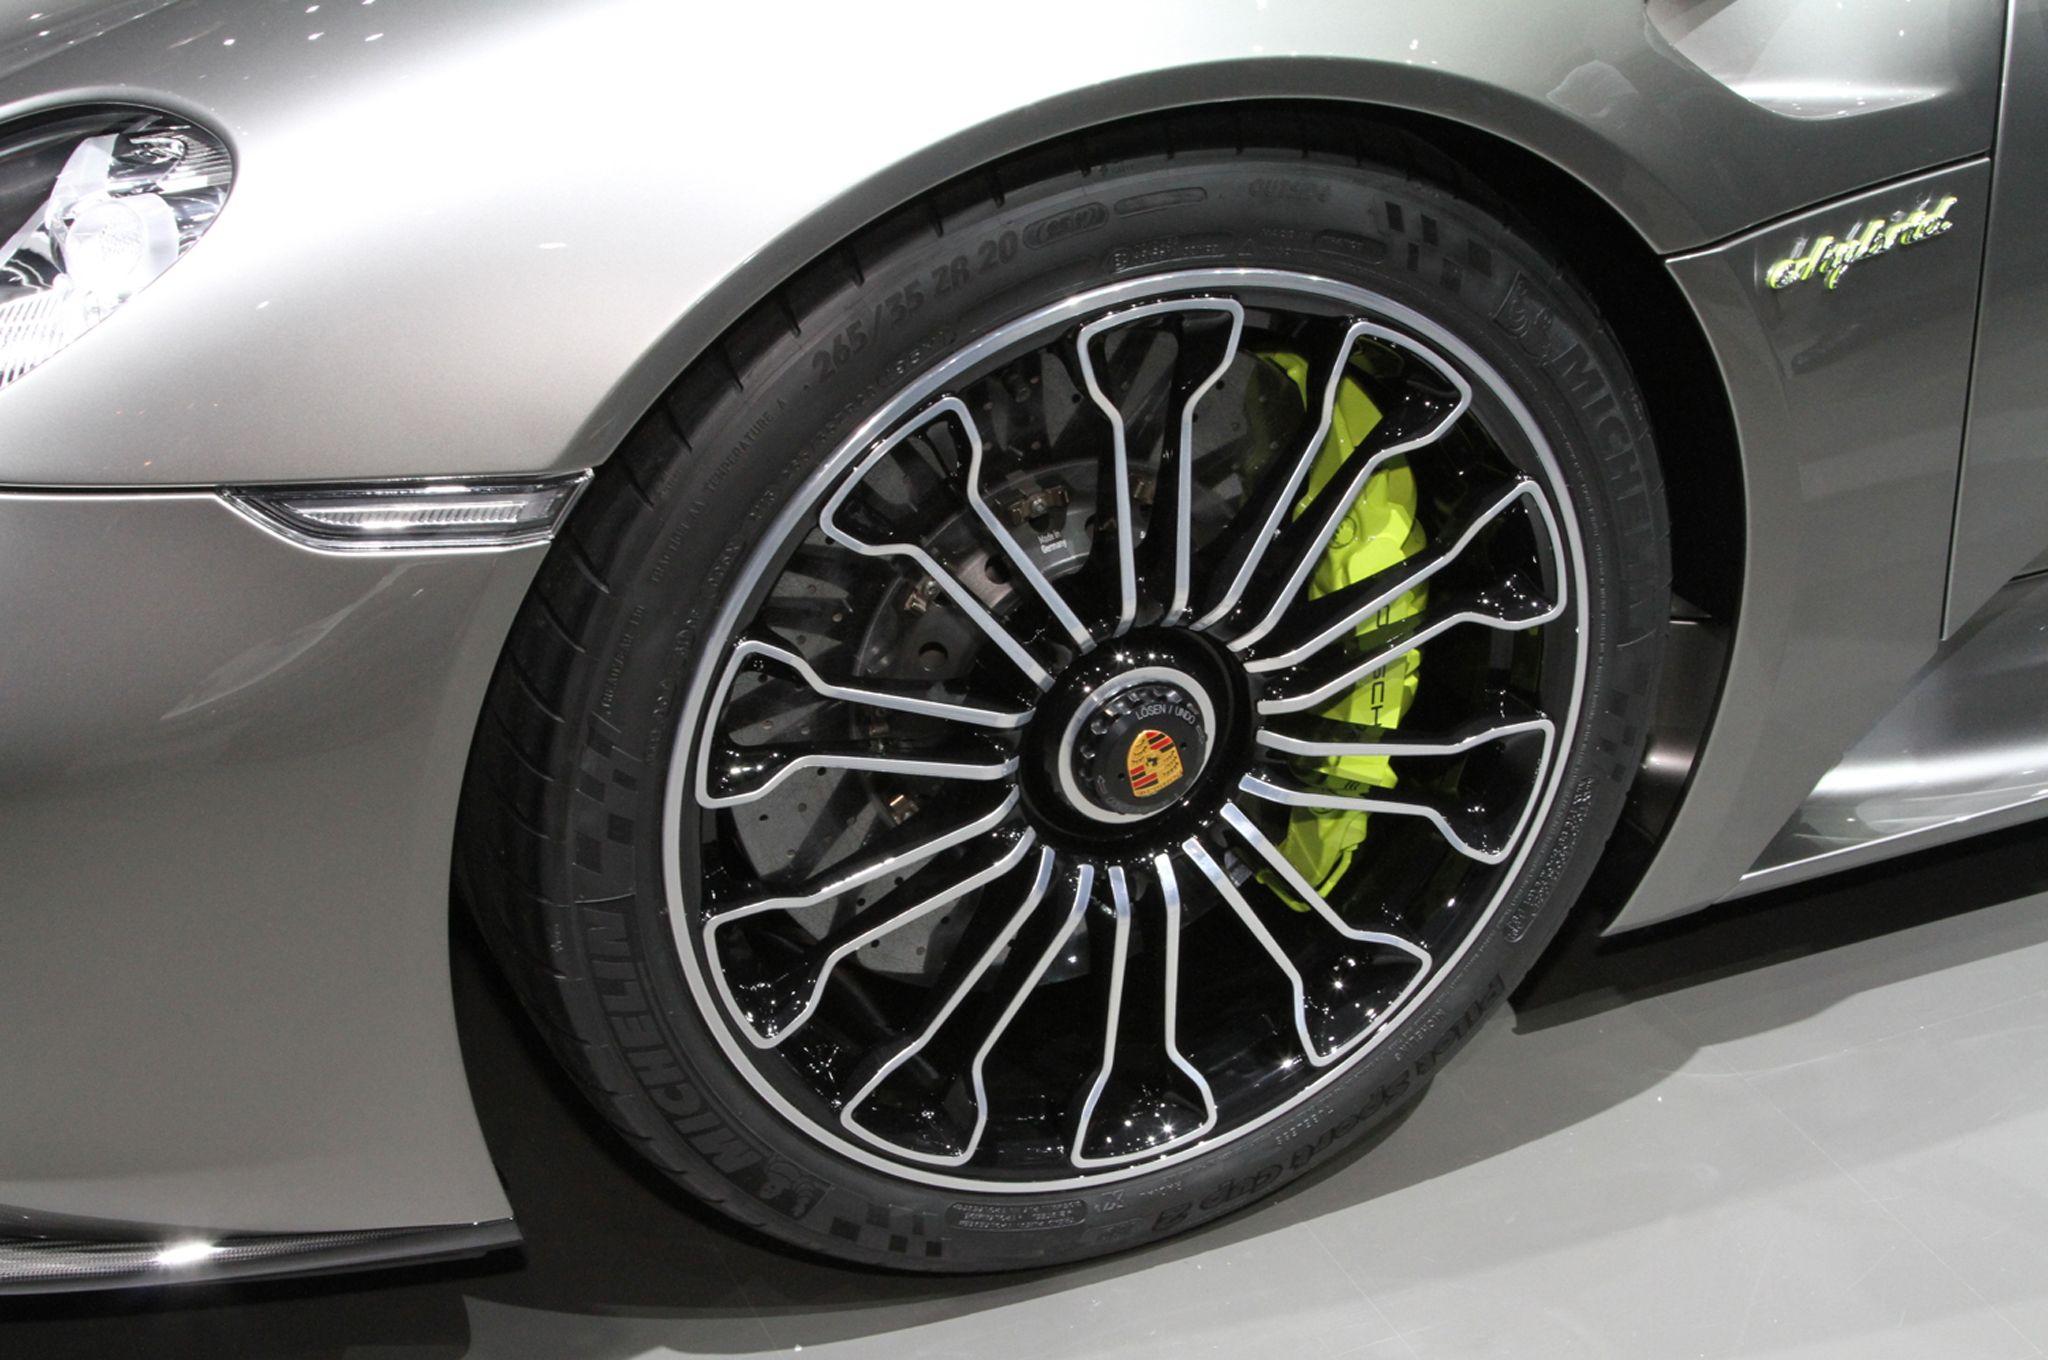 2014 porsche 918 spyder wheel exterior